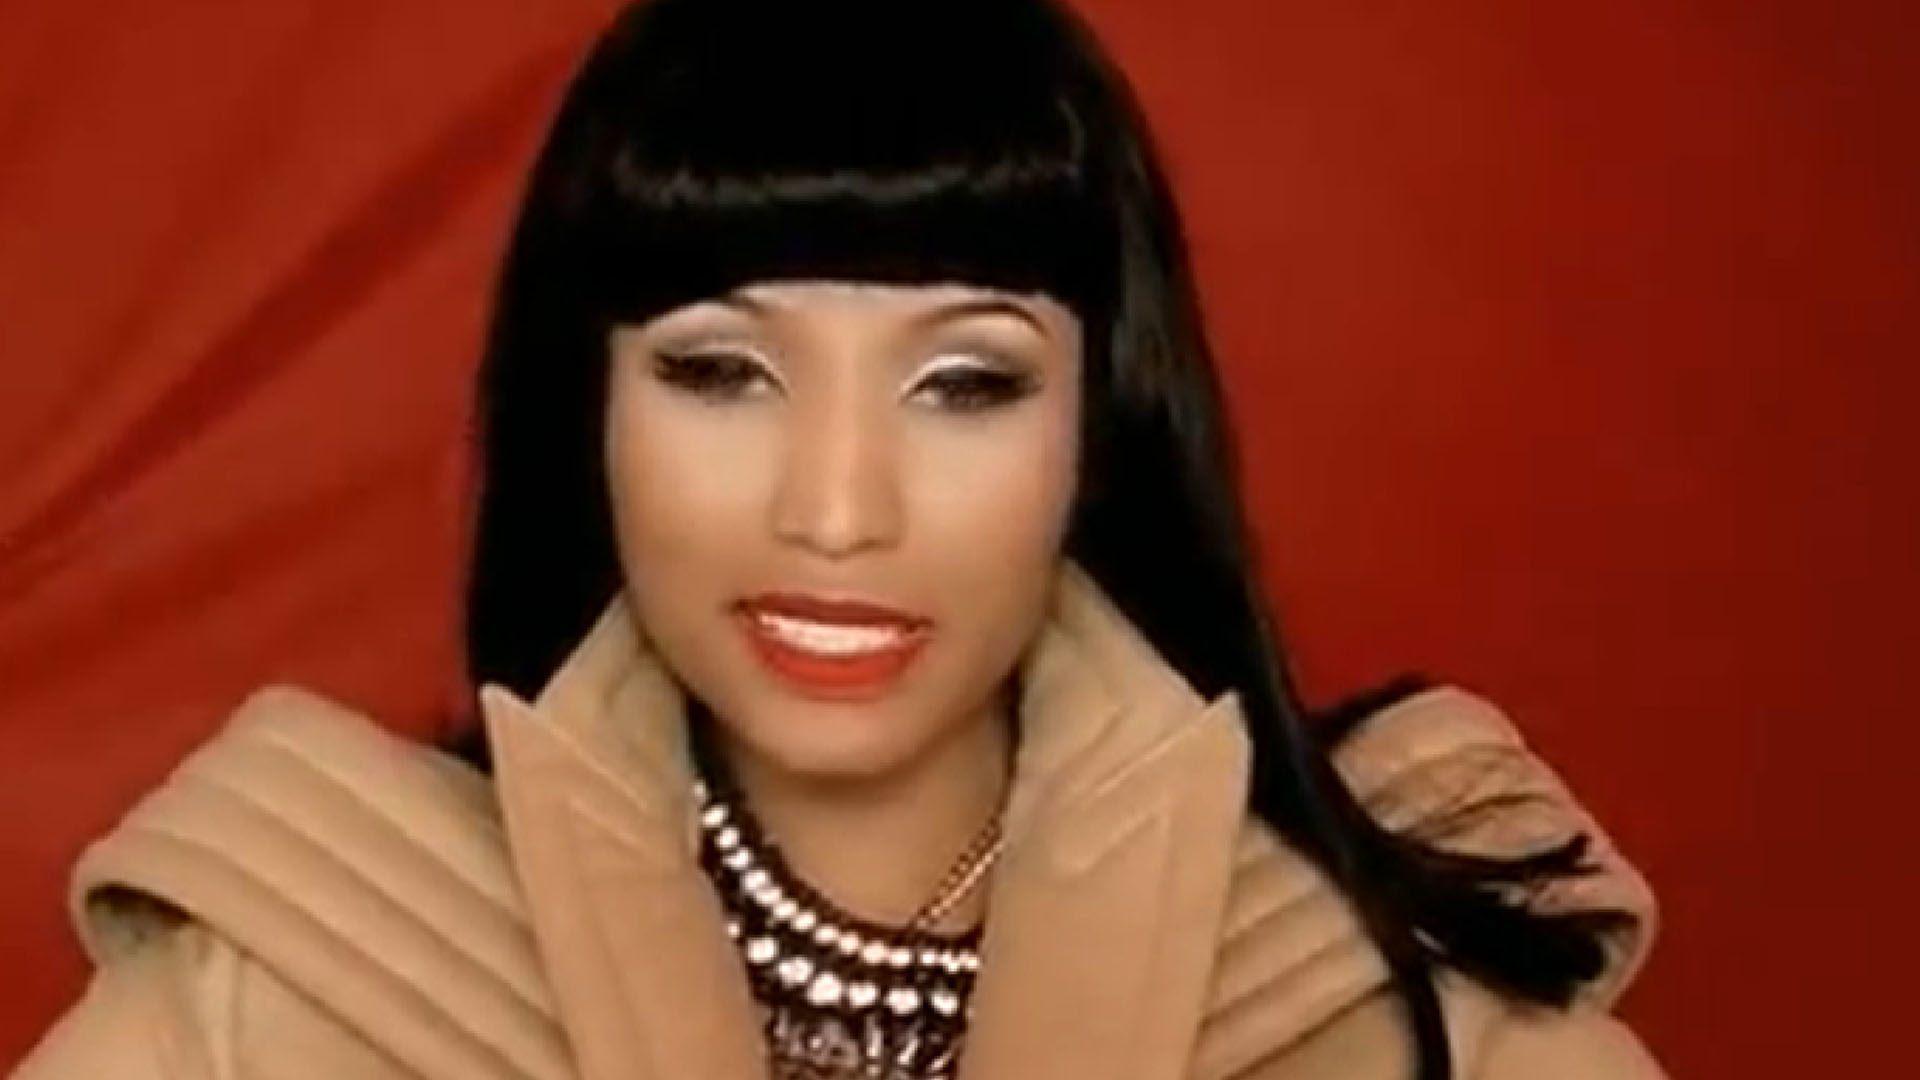 267c86d50b66b Nicki Minaj's Boyfriend Kenneth Petty Gets Huge Neck Tattoo of Her Name